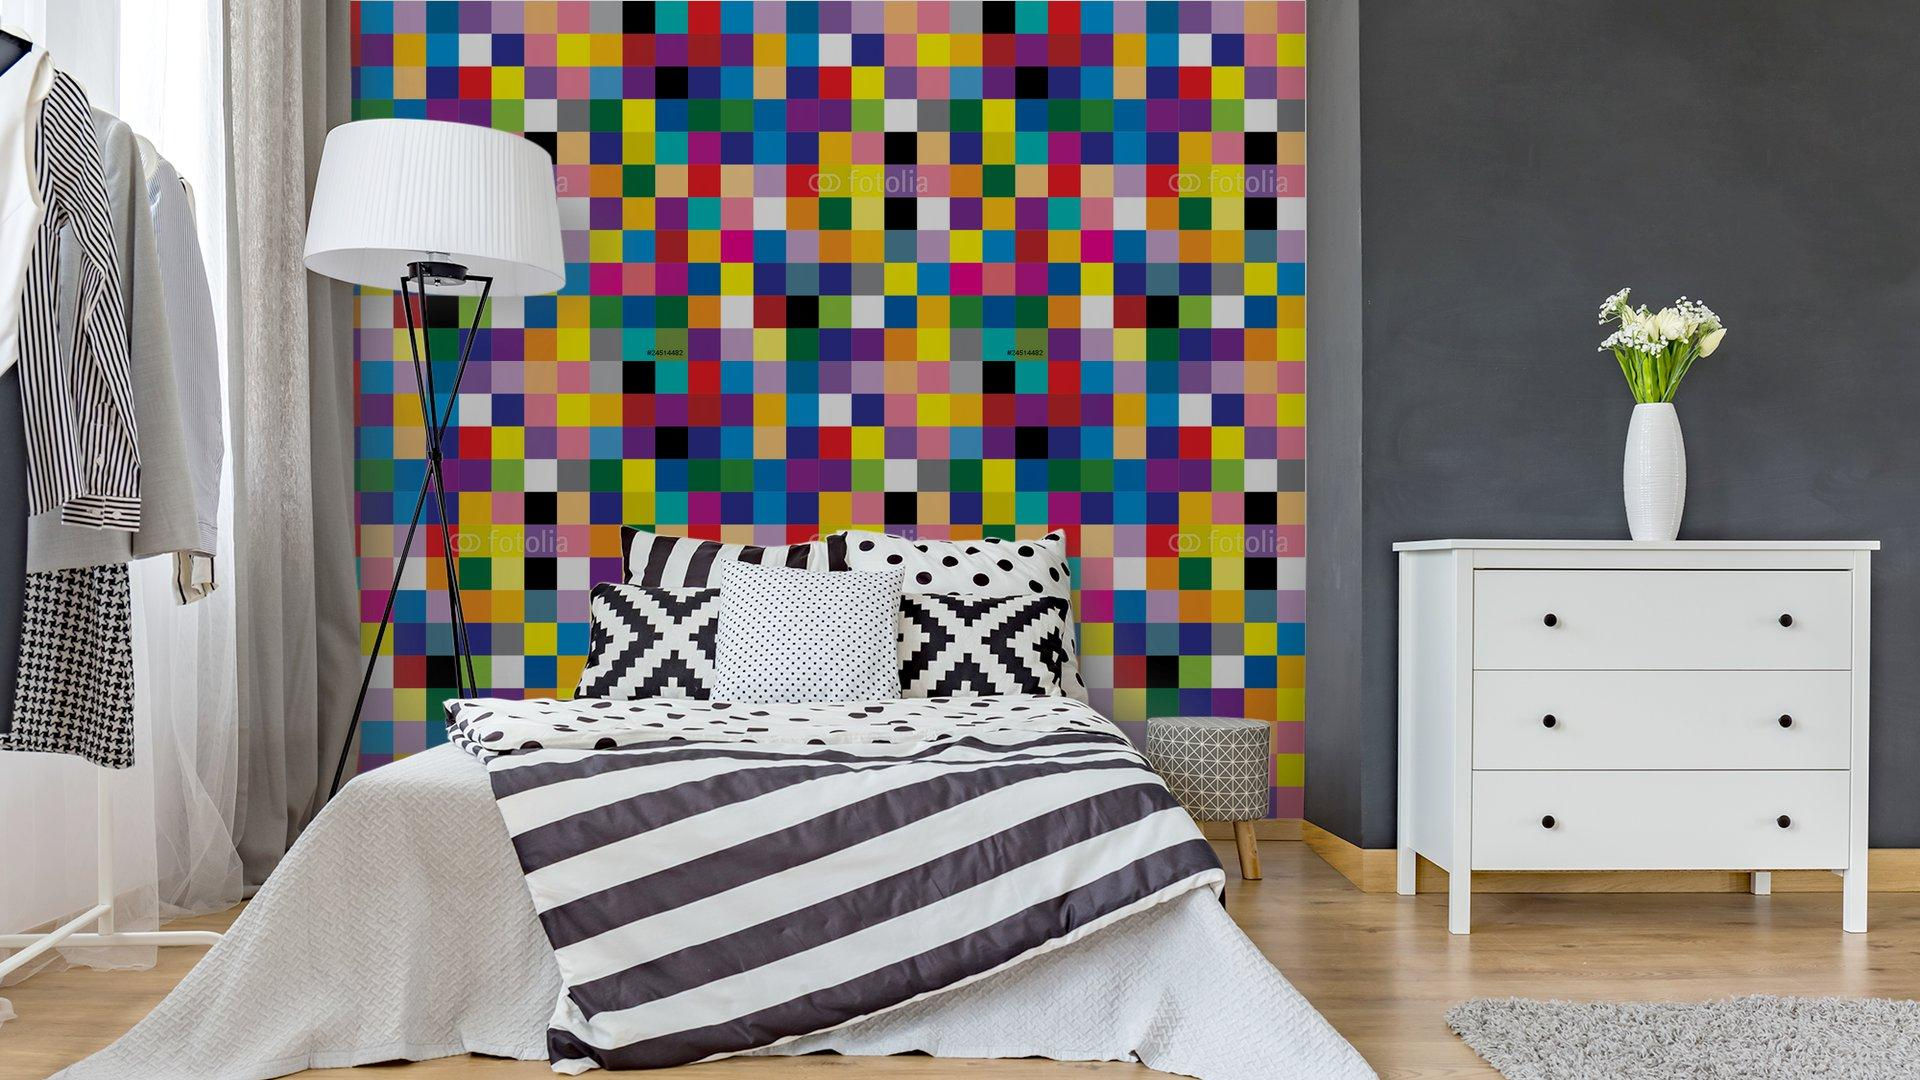 Fotomurales mexico papeles pintados abstracto cuadrado 3 - PapelTapizAbstracto Cuadros de Colores 01